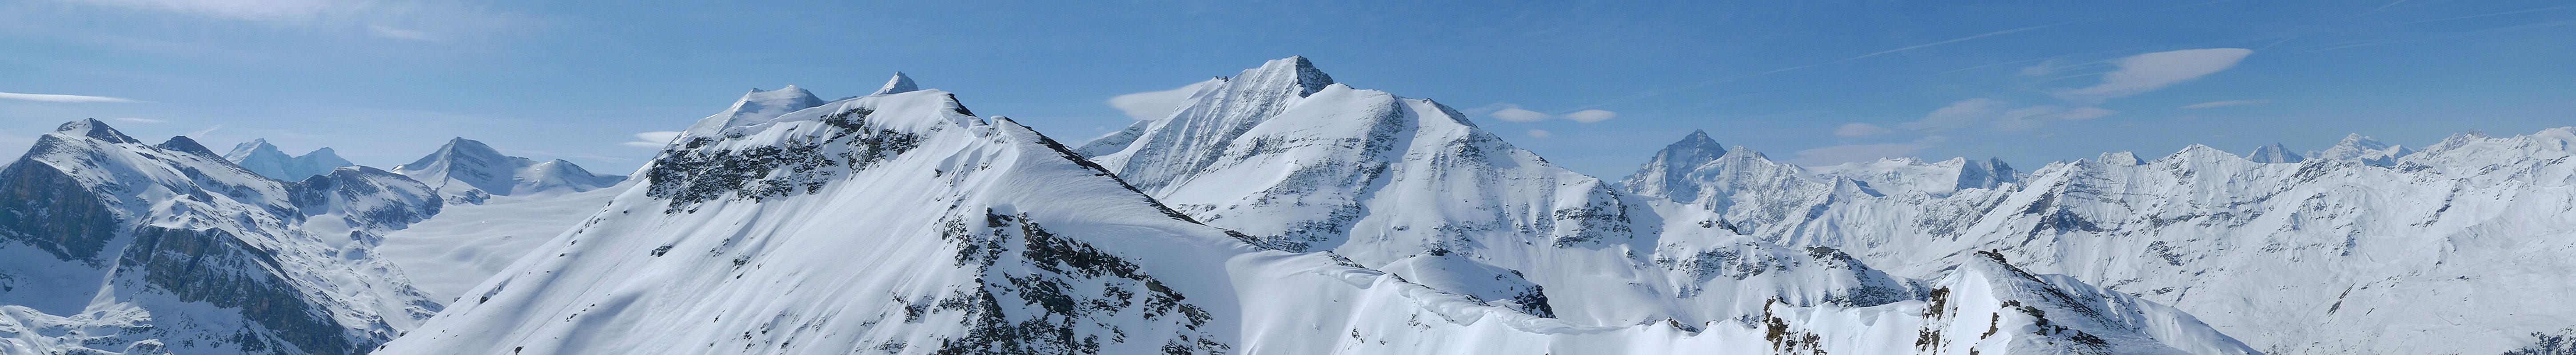 L´Omen Roso Walliser Alpen / Alpes valaisannes Schweiz panorama 31